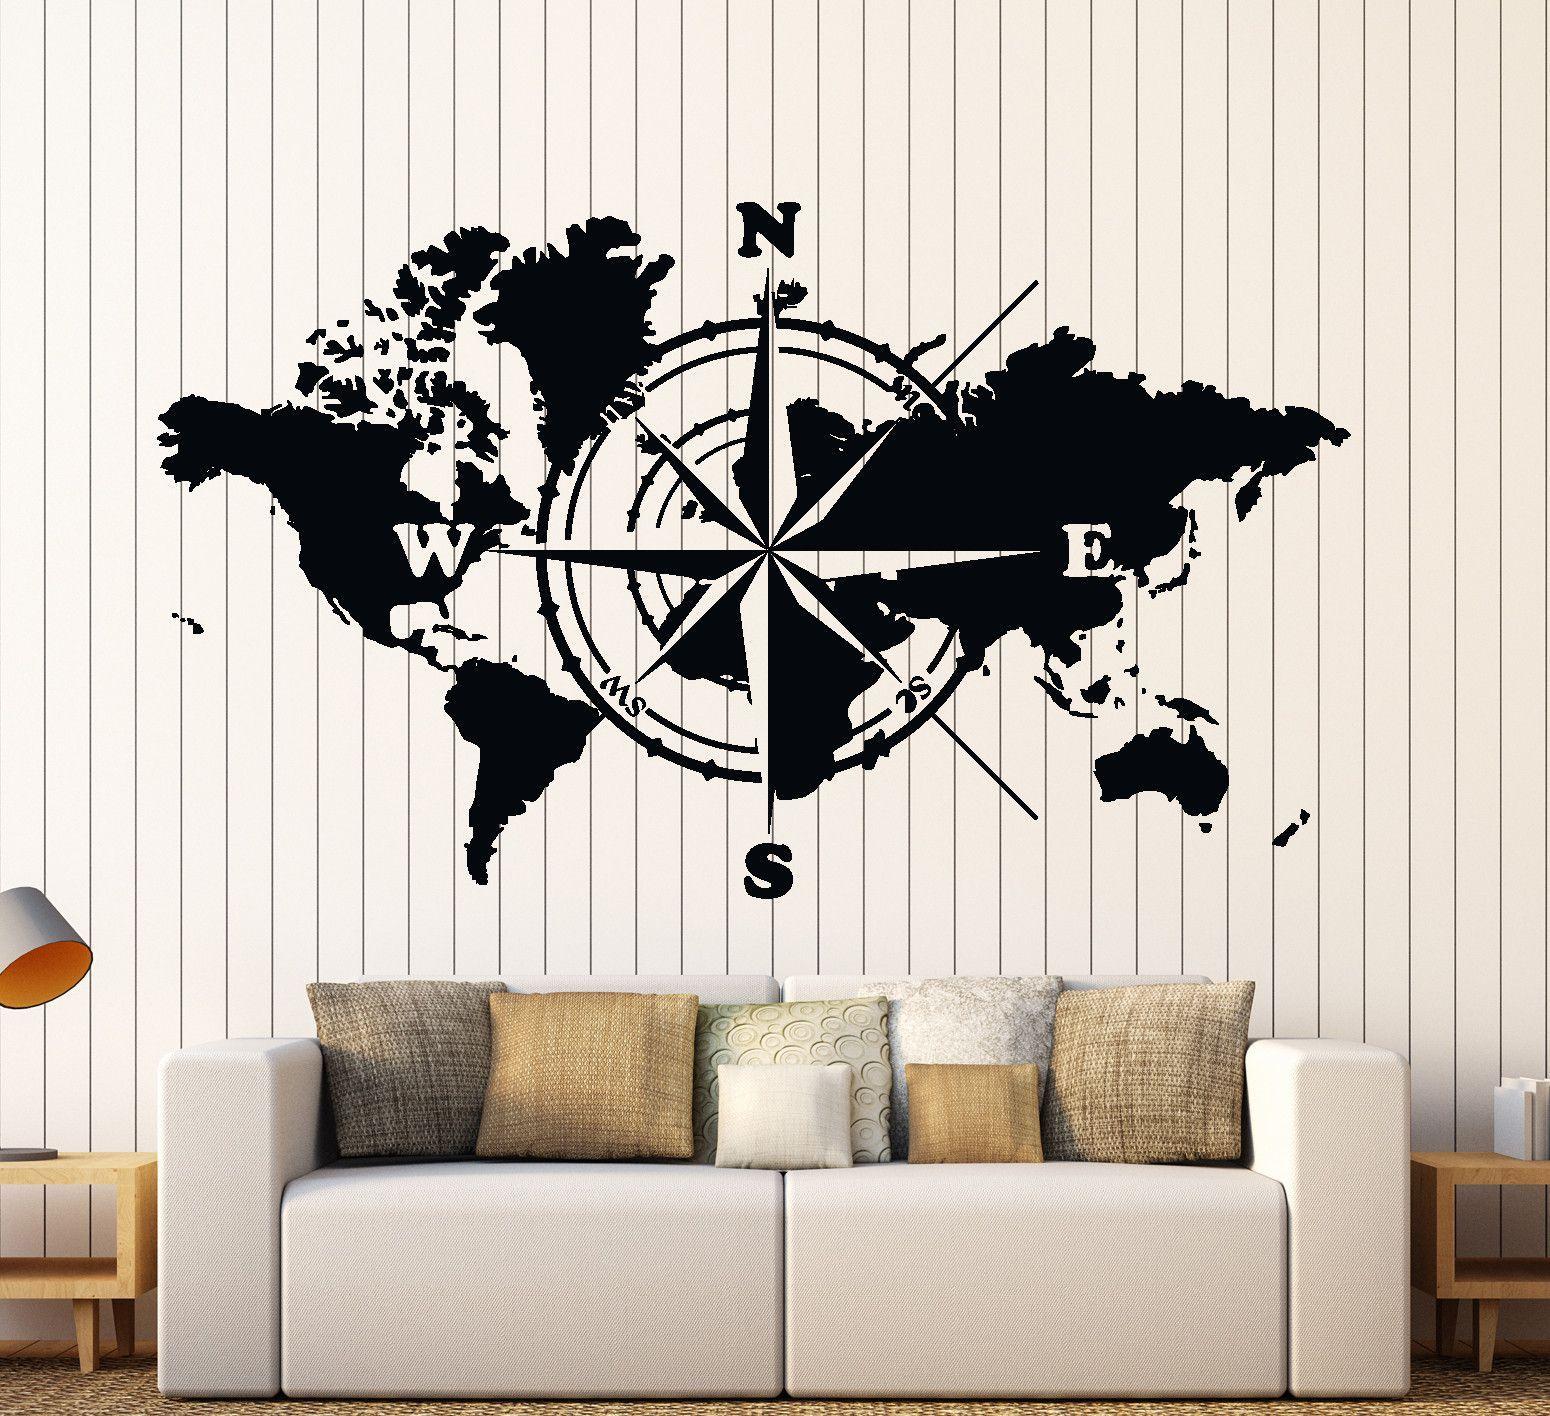 Wall Vinyl Decal World Map Atlas Of The World Compass Home Interior Decor z4422